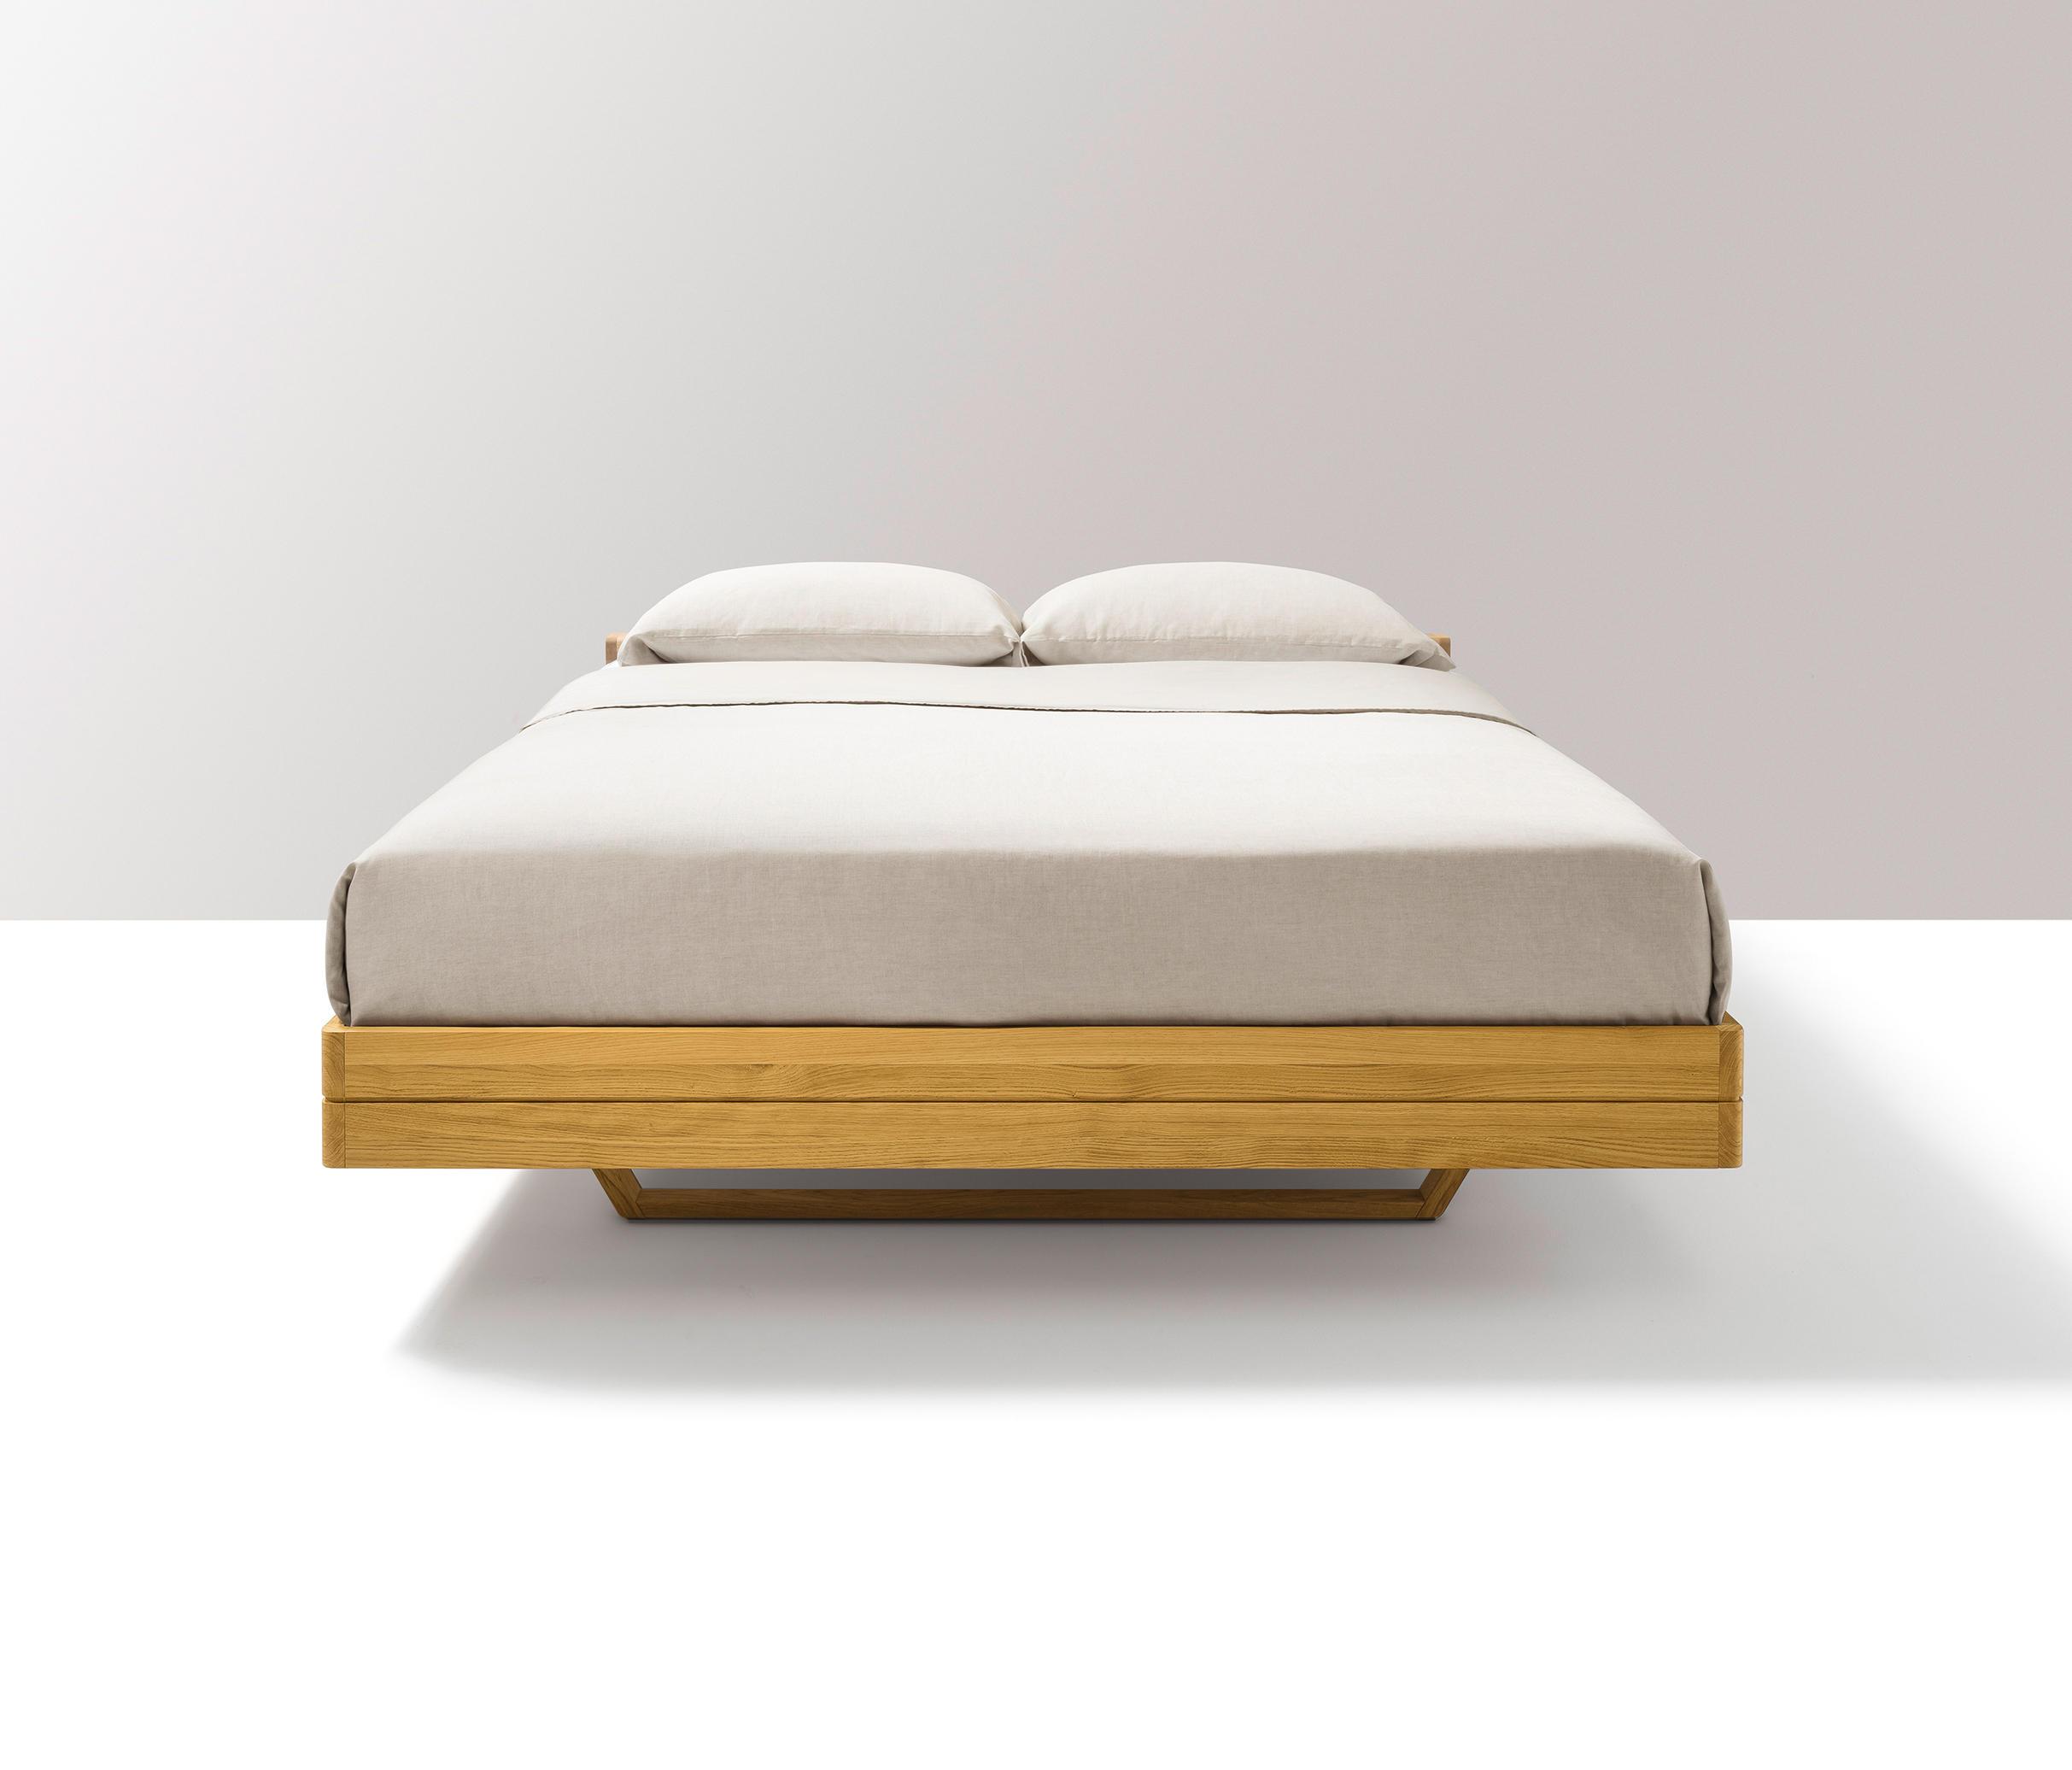 FLOAT BETT - Betten von TEAM 7 | Architonic